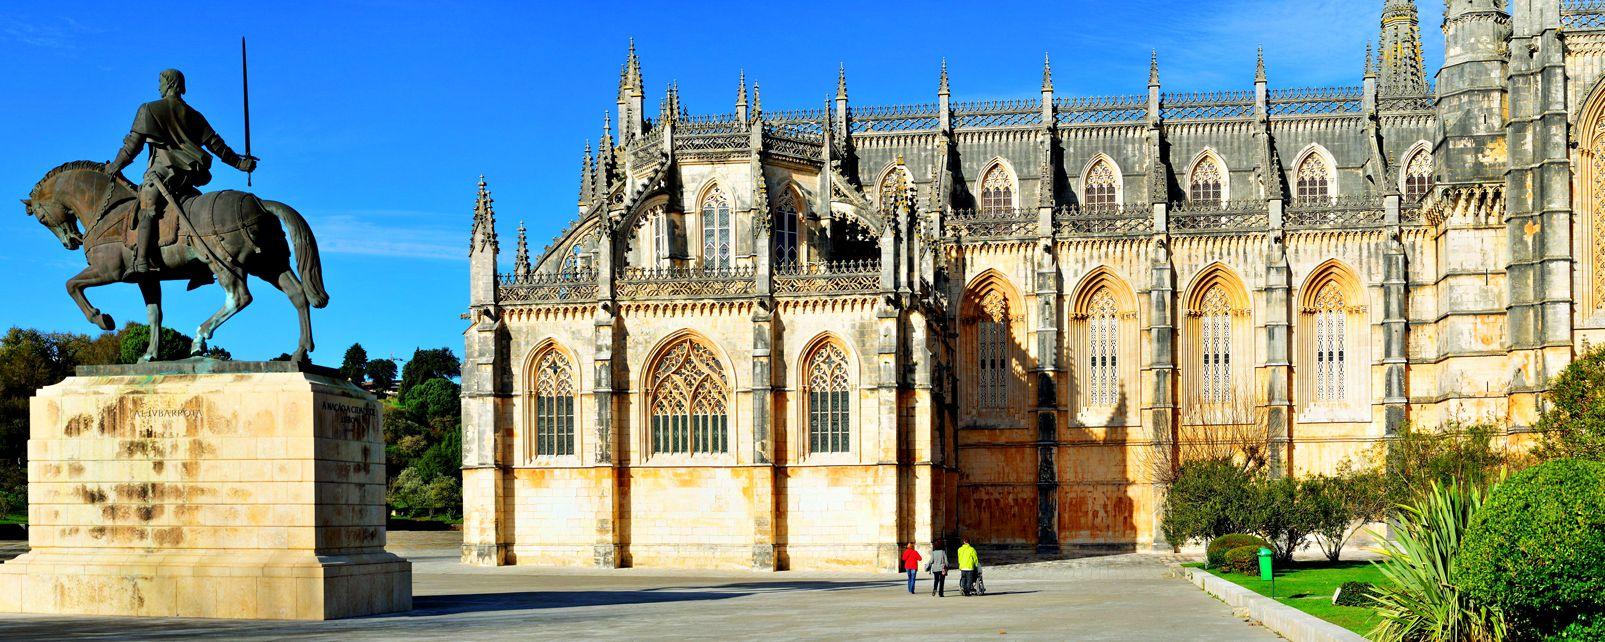 Monastère de Bathala , Monastère de Bathala, Portugal , Portugal